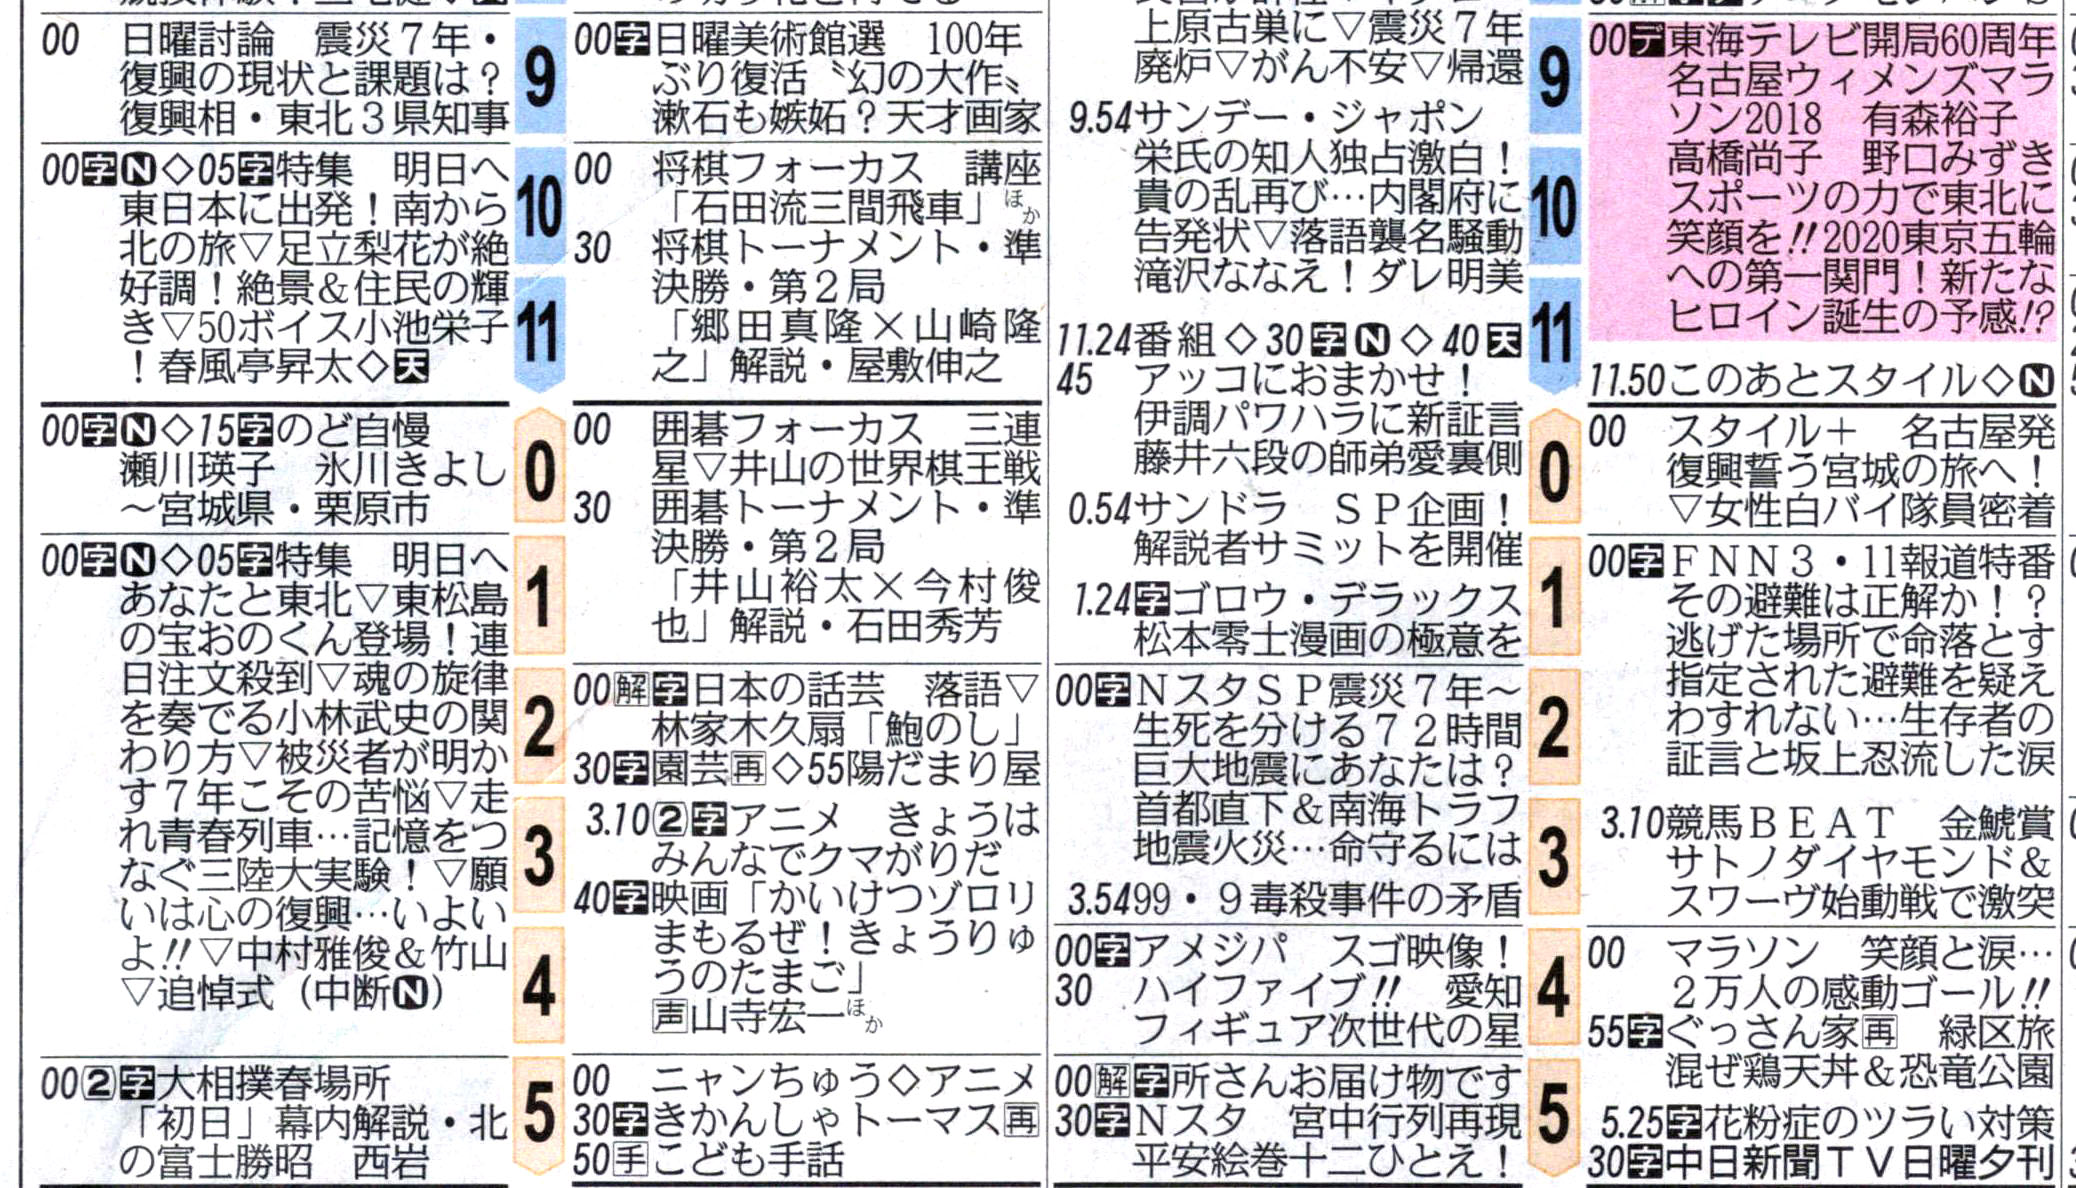 https://img.atwikiimg.com/www45.atwiki.jp/jippensha/attach/93/7314/13_NHK%E3%83%86%E3%83%AC%E3%83%93%E6%AC%84%20%E7%B8%A6%E8%AA%AD%E3%81%BF.jpg